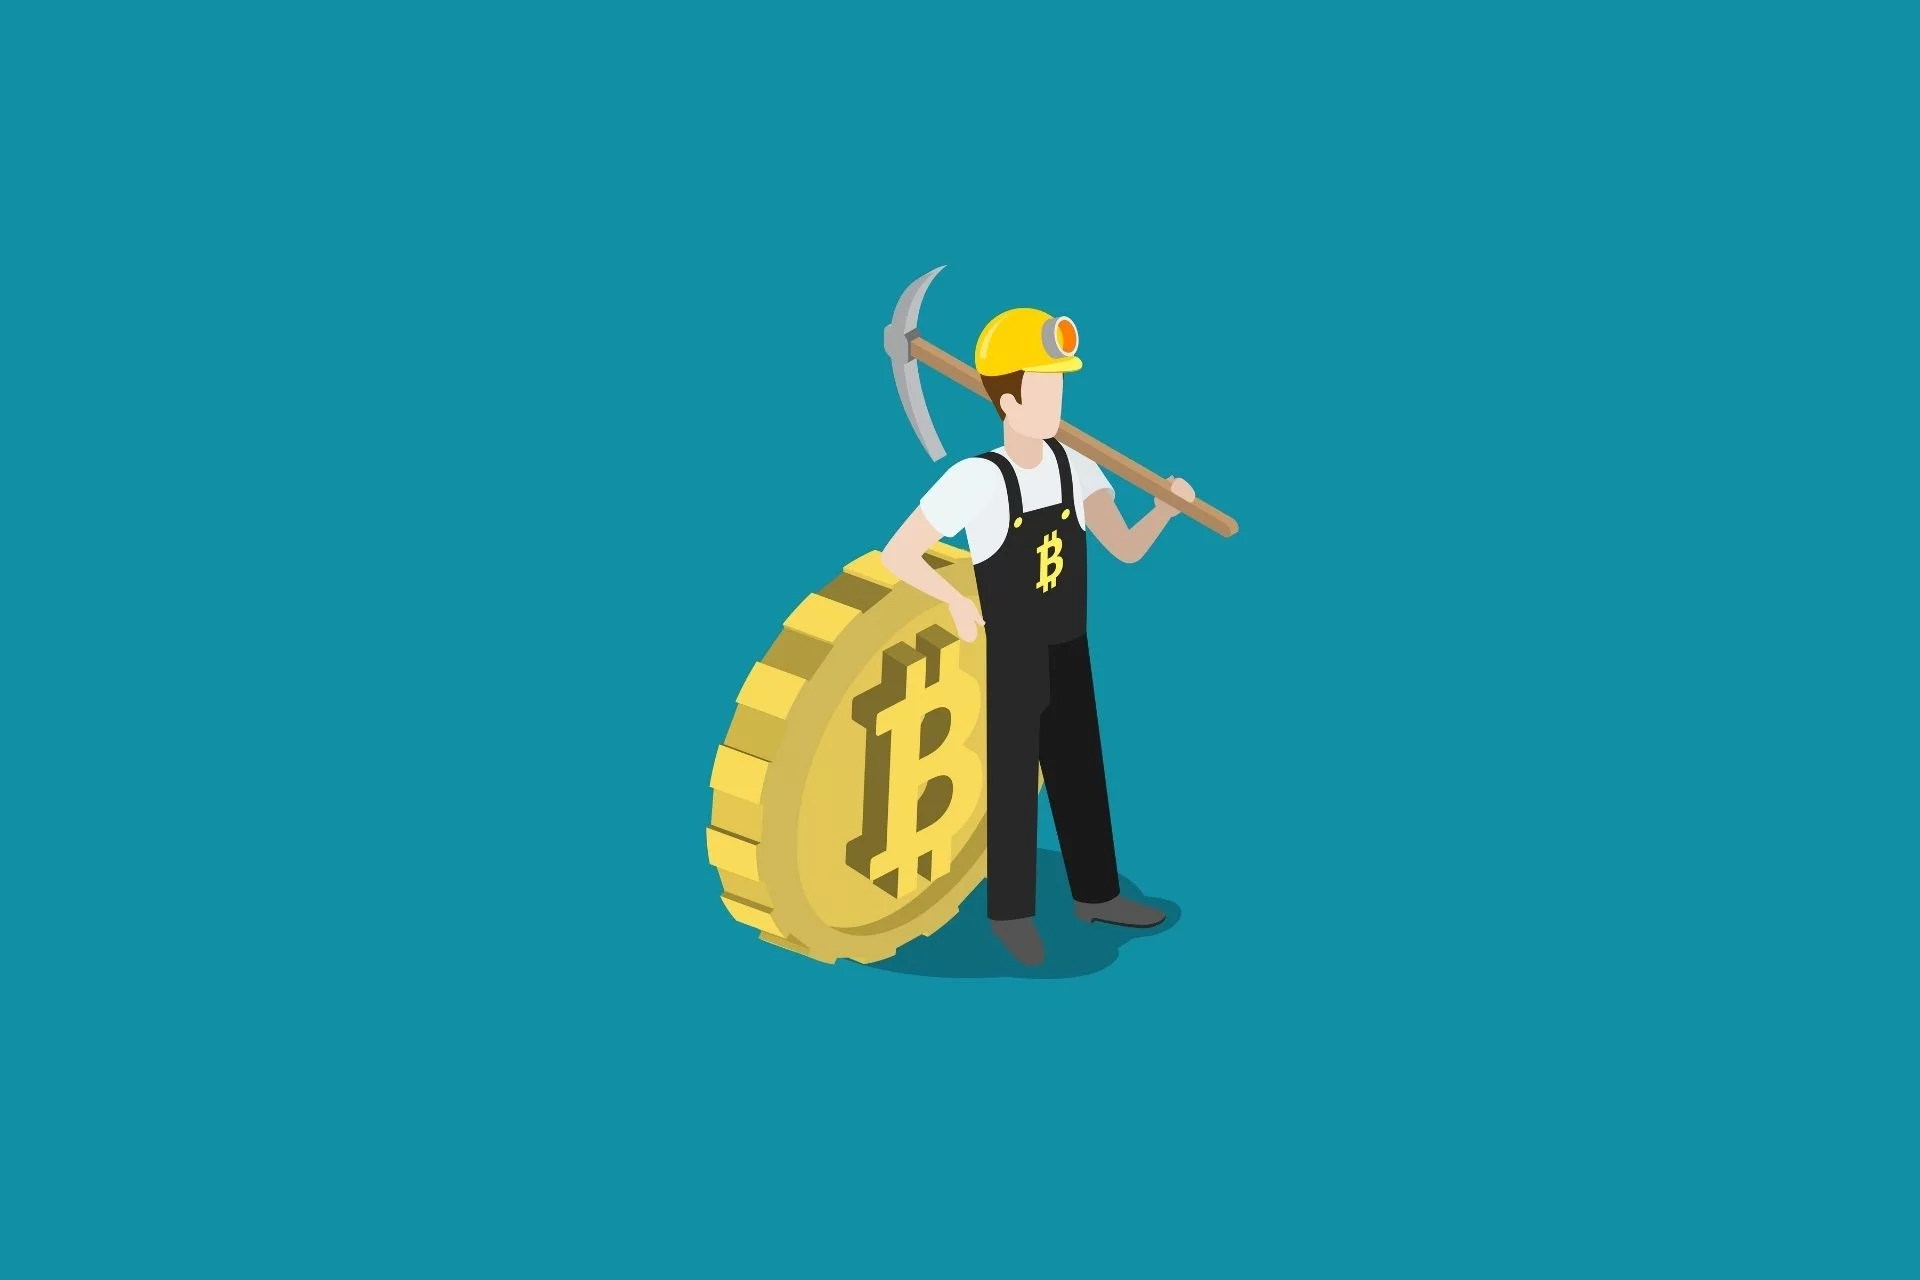 Intercambio de criptomonedas Binance presenta un curso gratuito sobre minería de Bitcoin